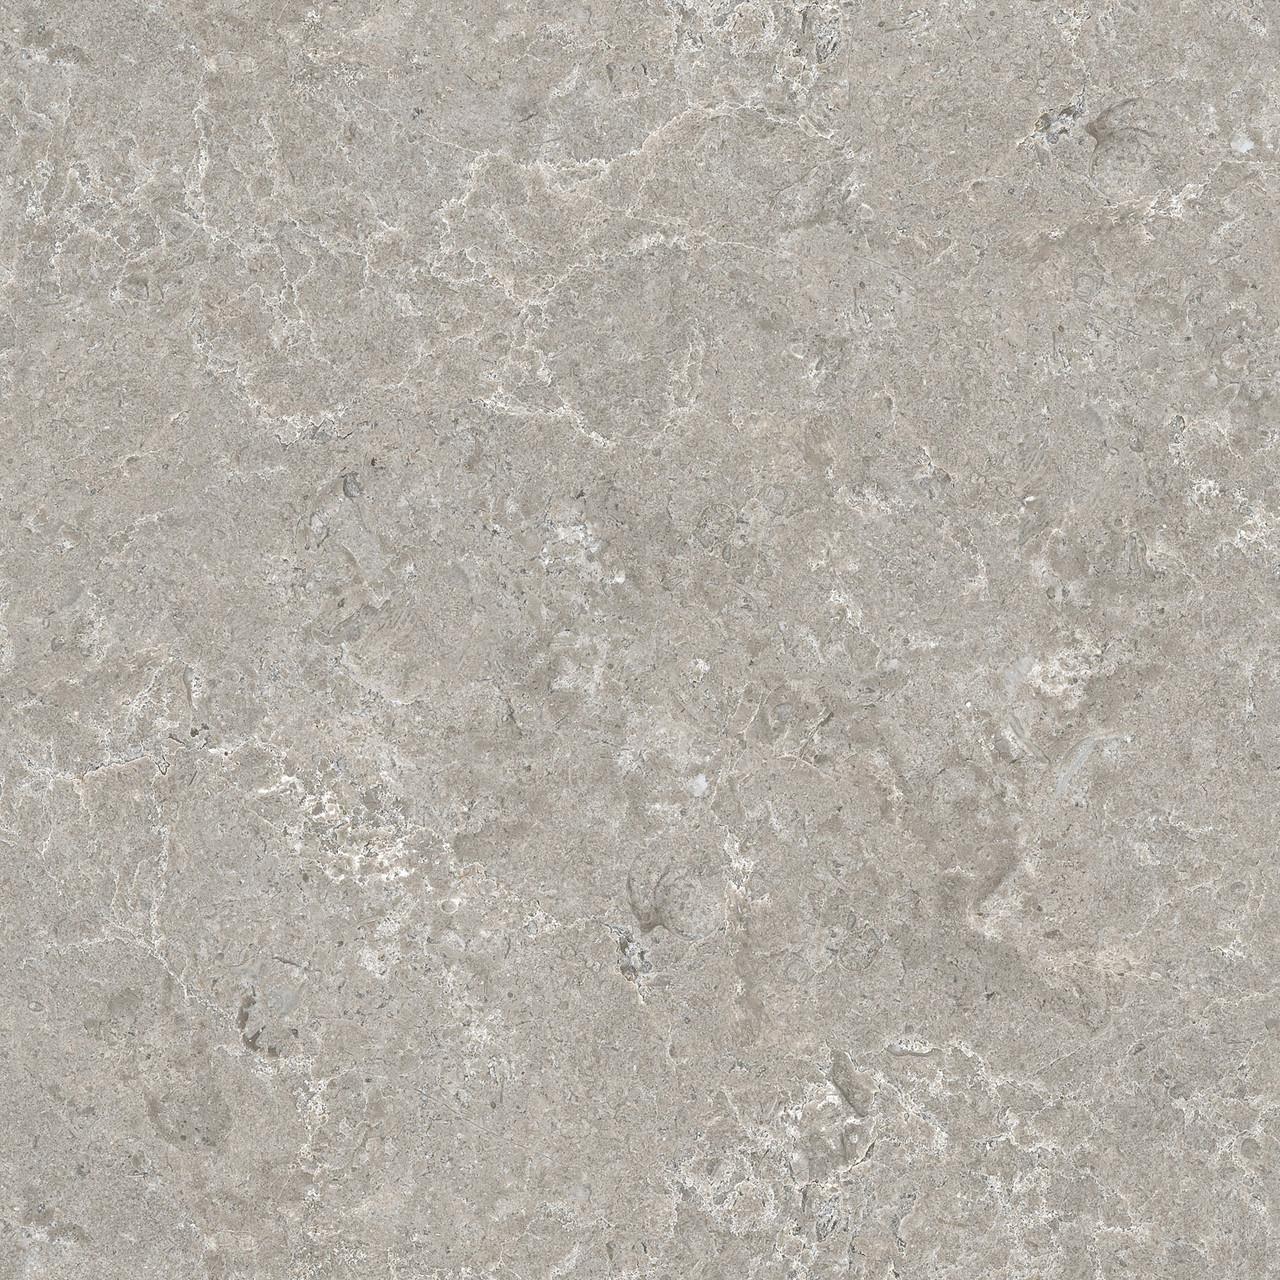 Плитка для пола Almera коричневый 607x607x10 мм